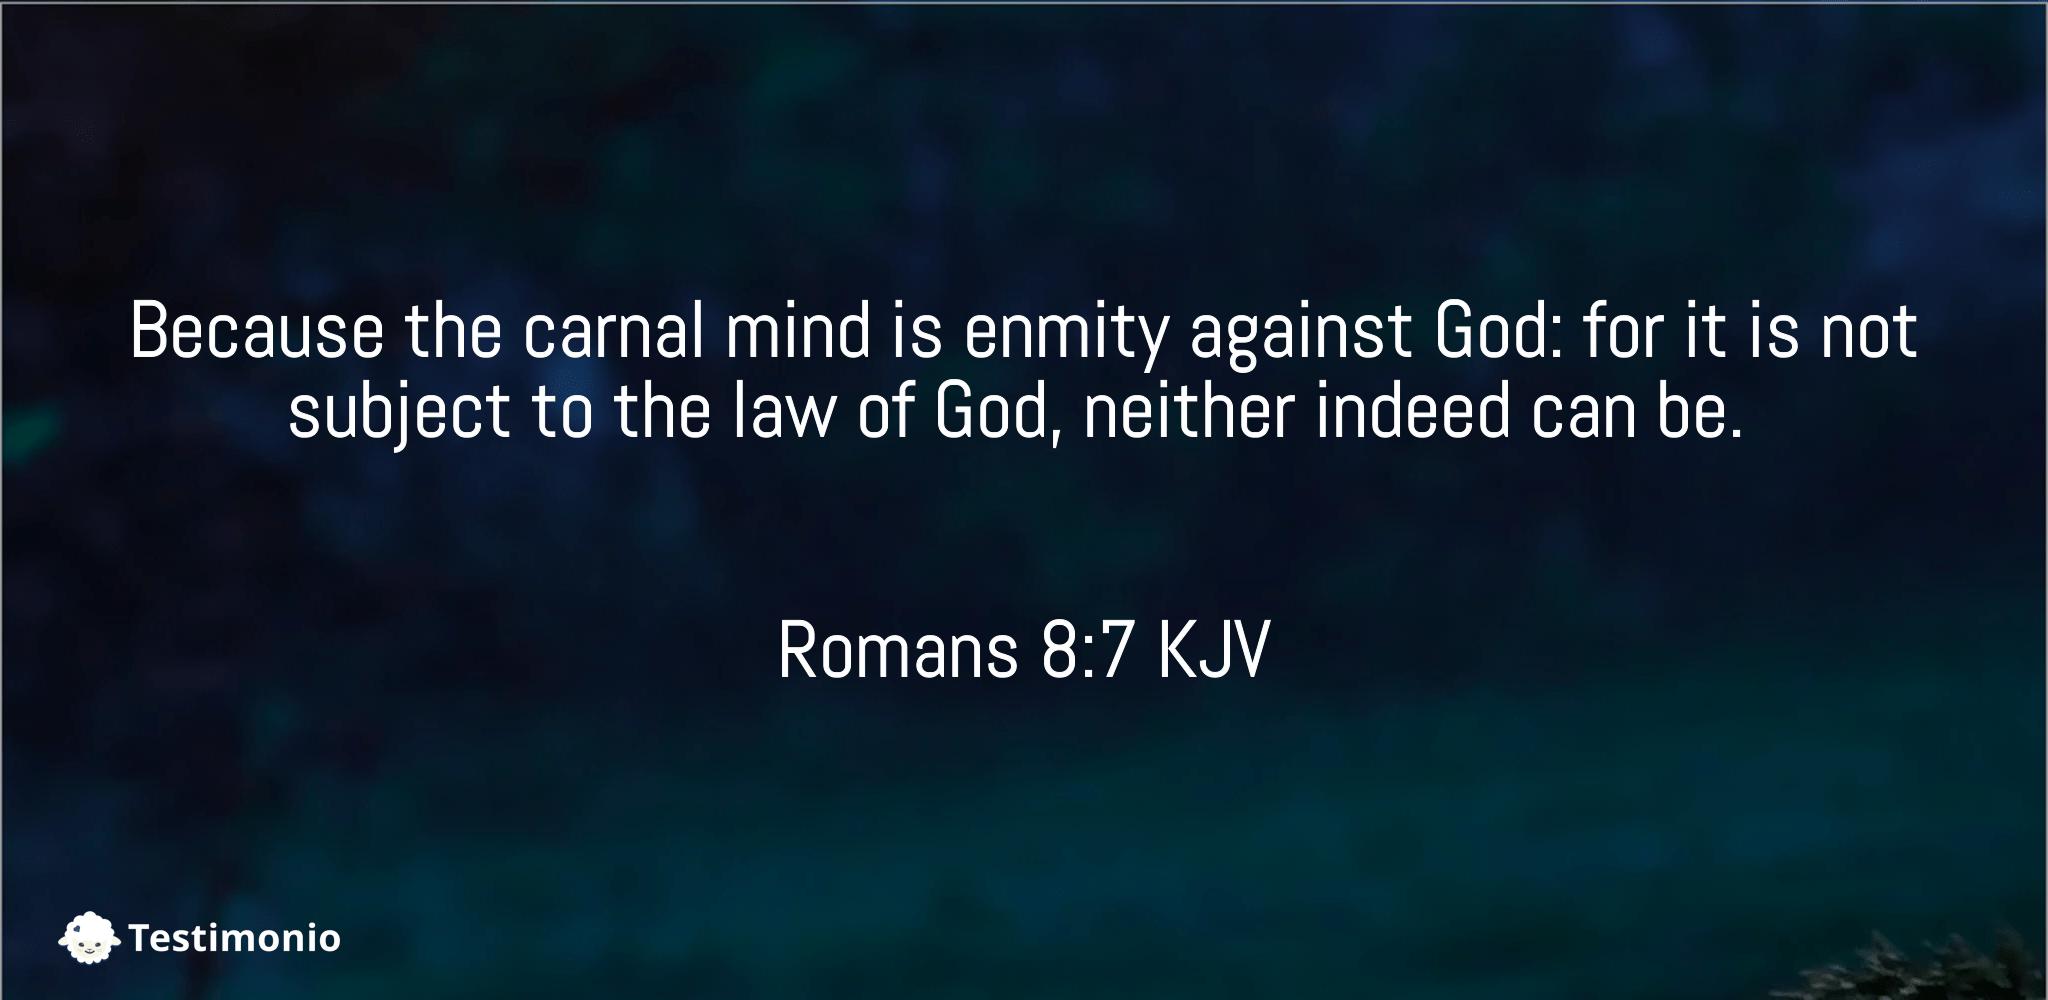 Romans 8:7